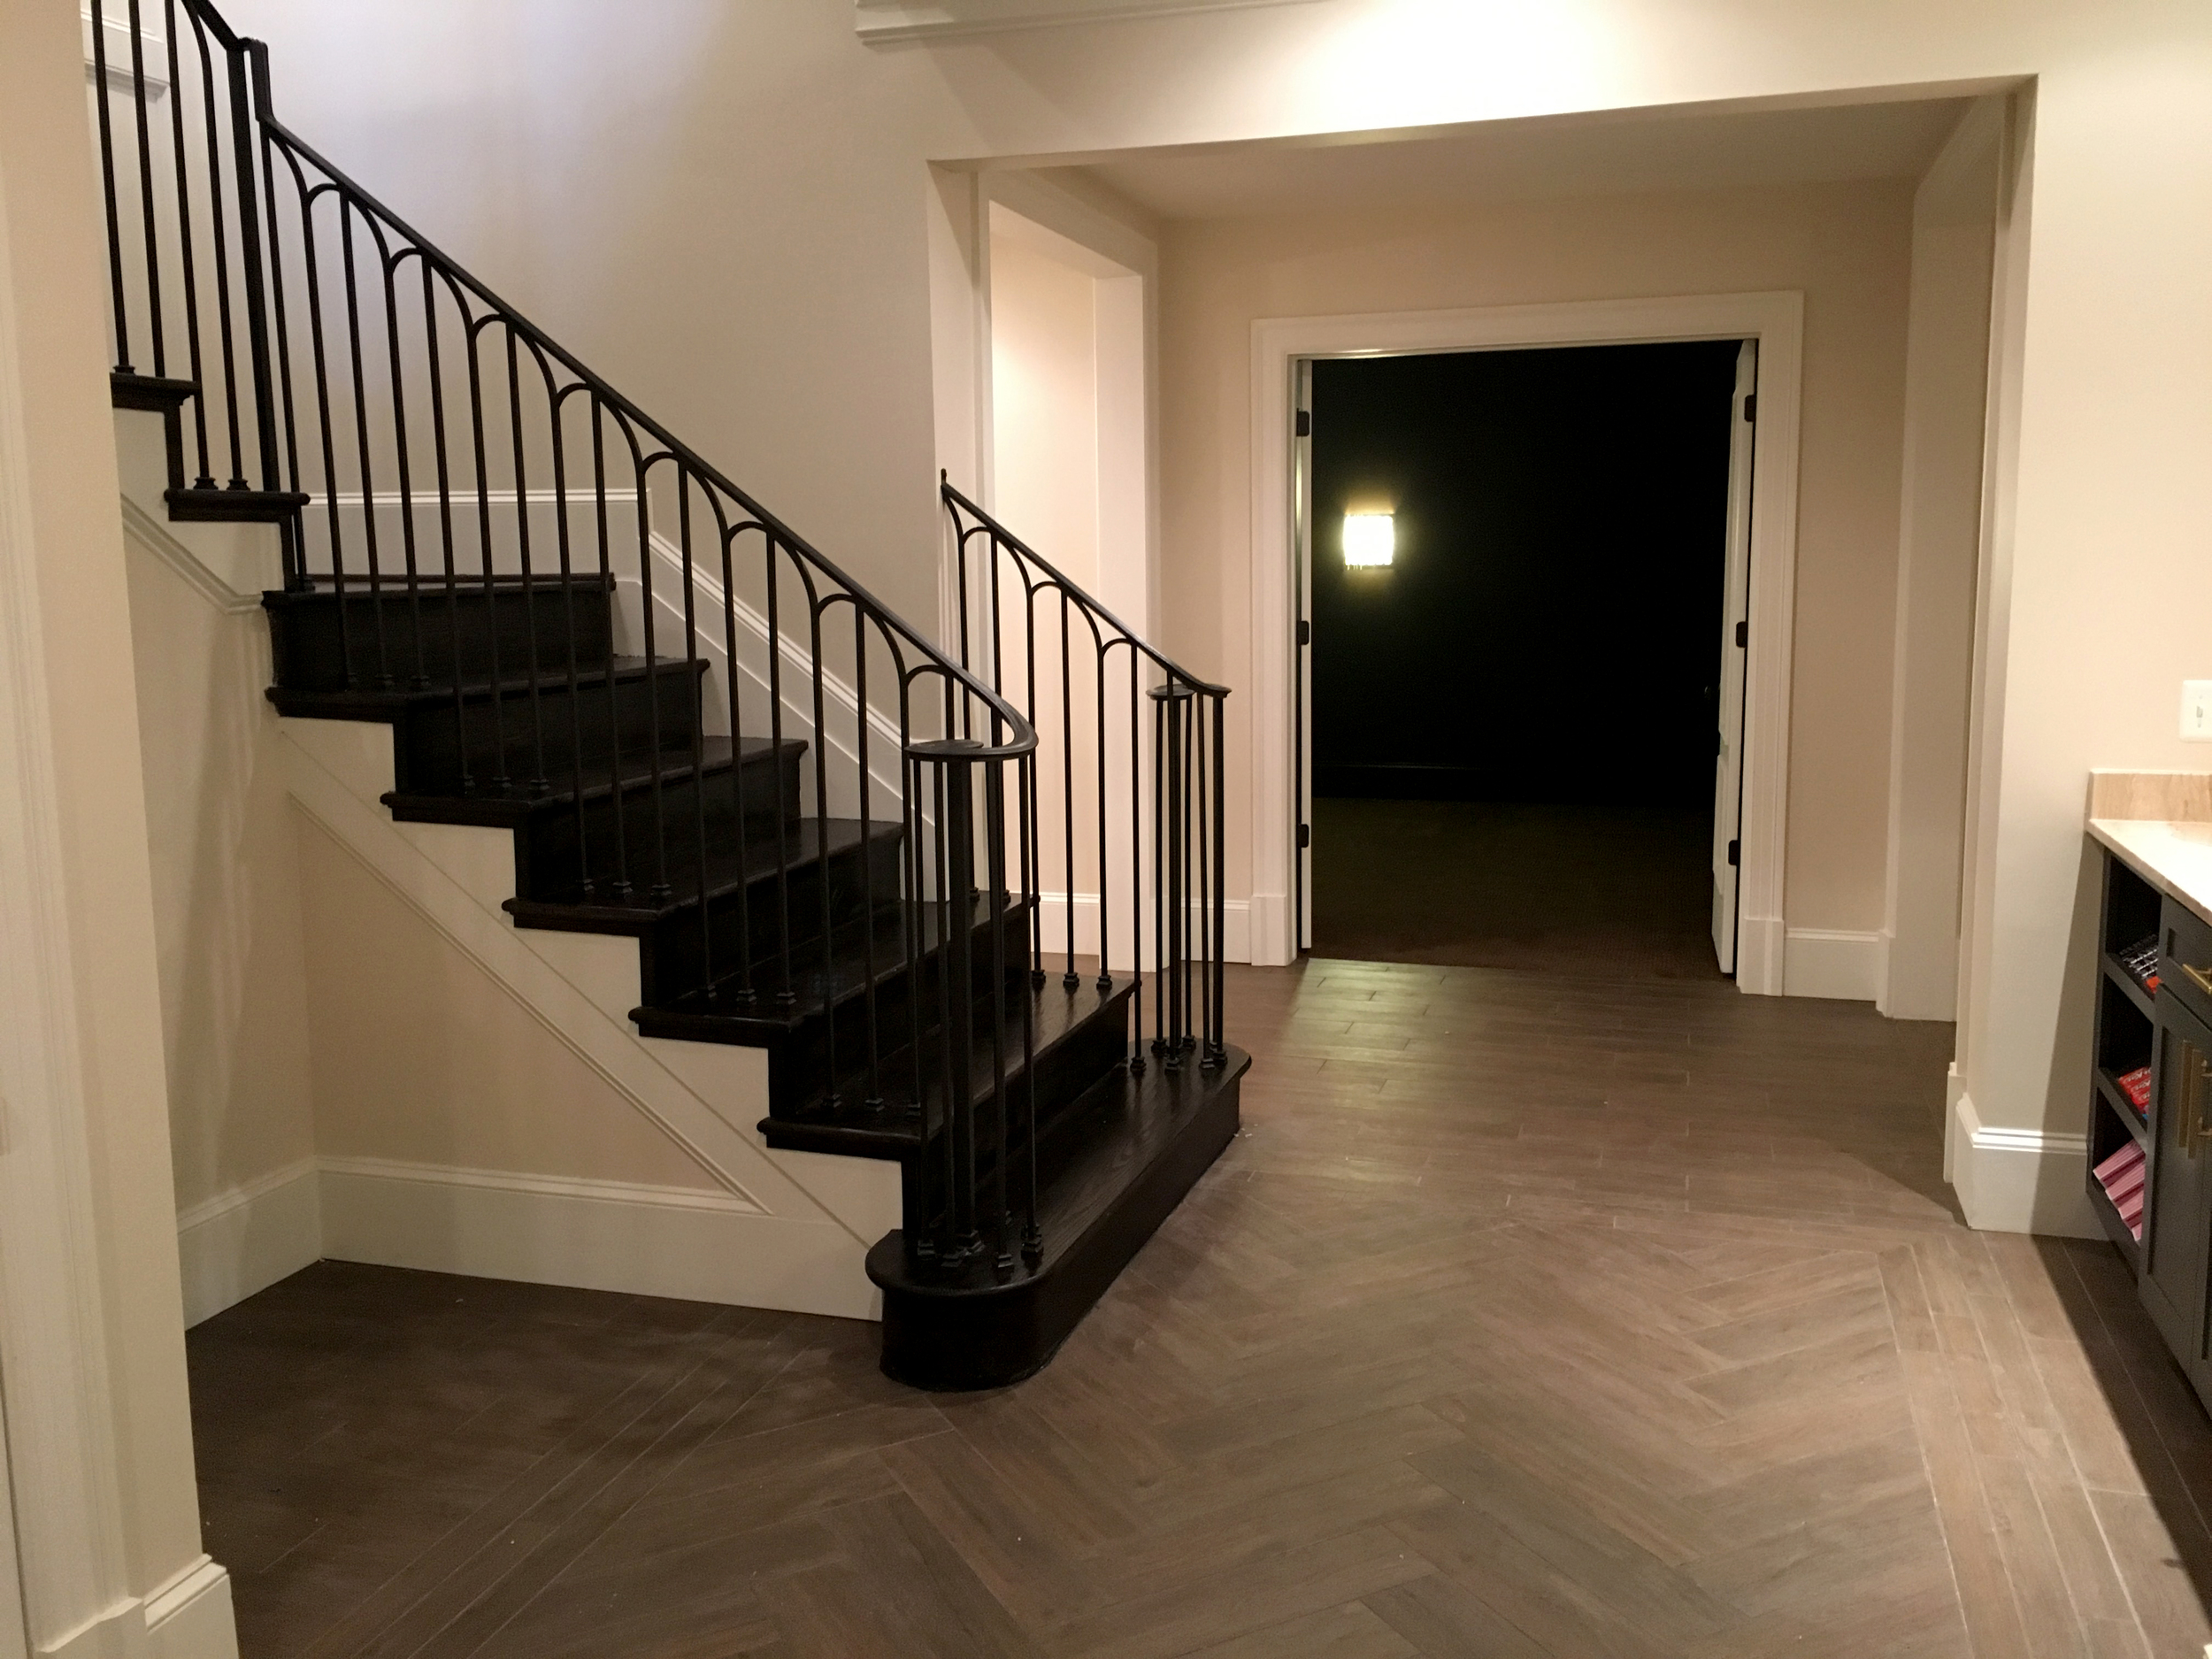 Home Builder Remodeling Additions Manassas Va Old Dominion Custom Homes